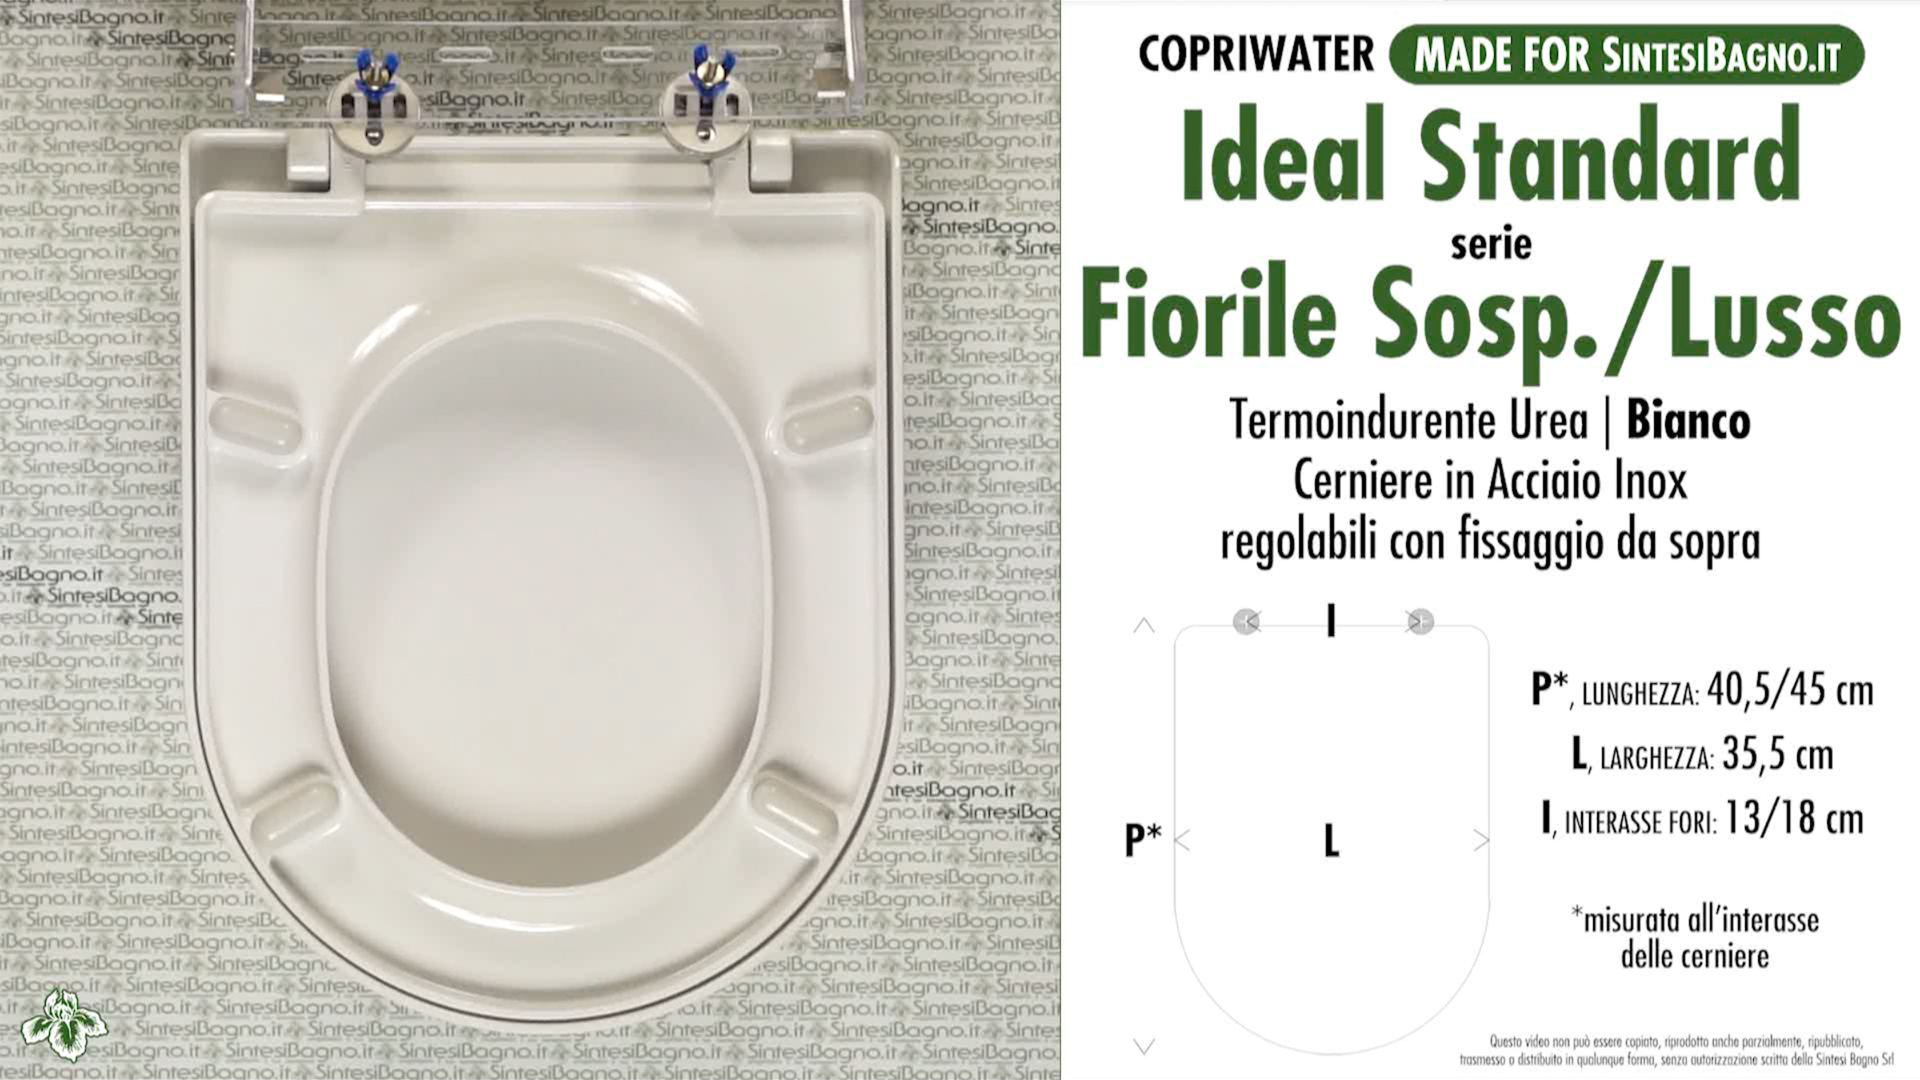 schede tecniche misure copriwater ideal standard serie